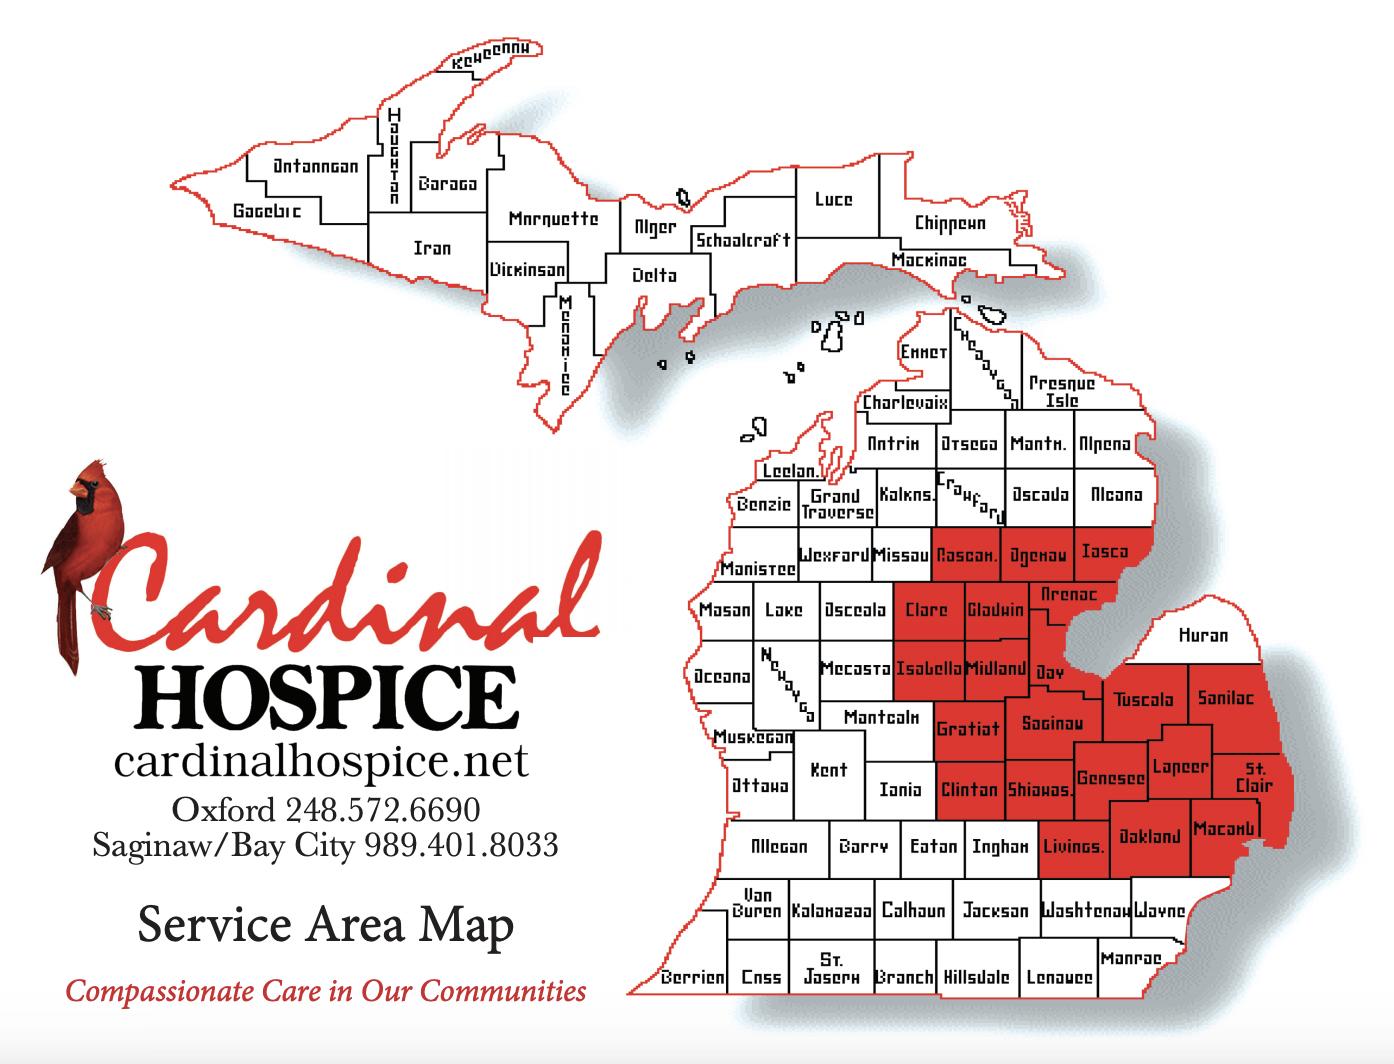 Cardinal Hospice Michigan Service Areas